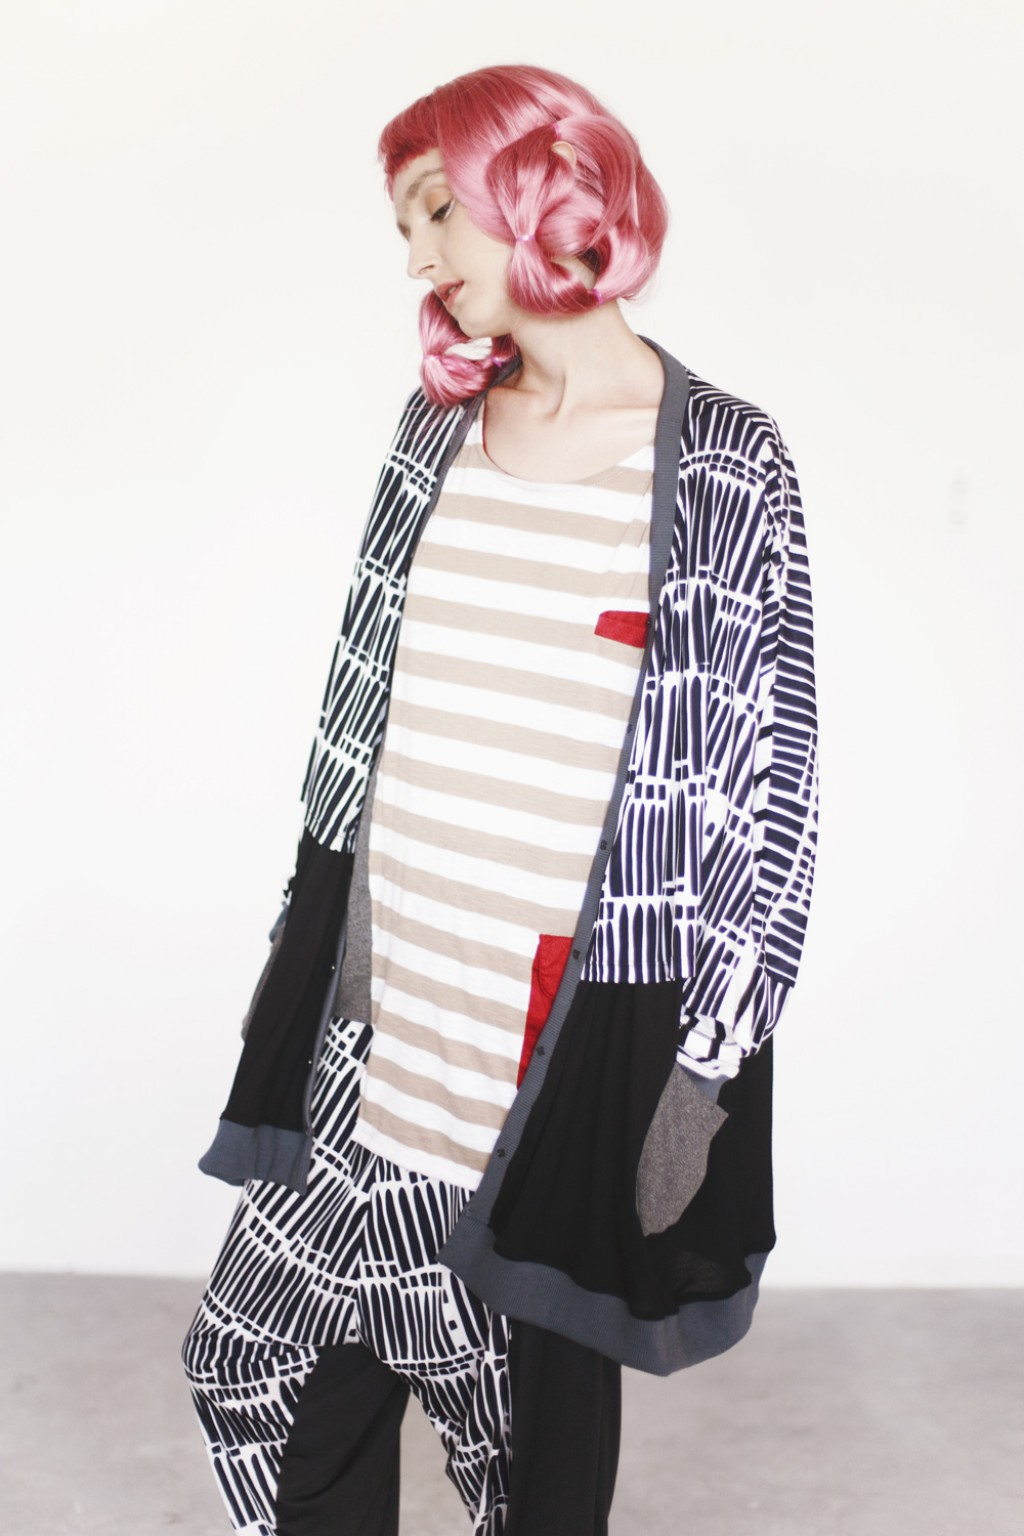 #PopbelaOOTD: Saatnya Upgrade Penampilanmu Pakai Cardigan